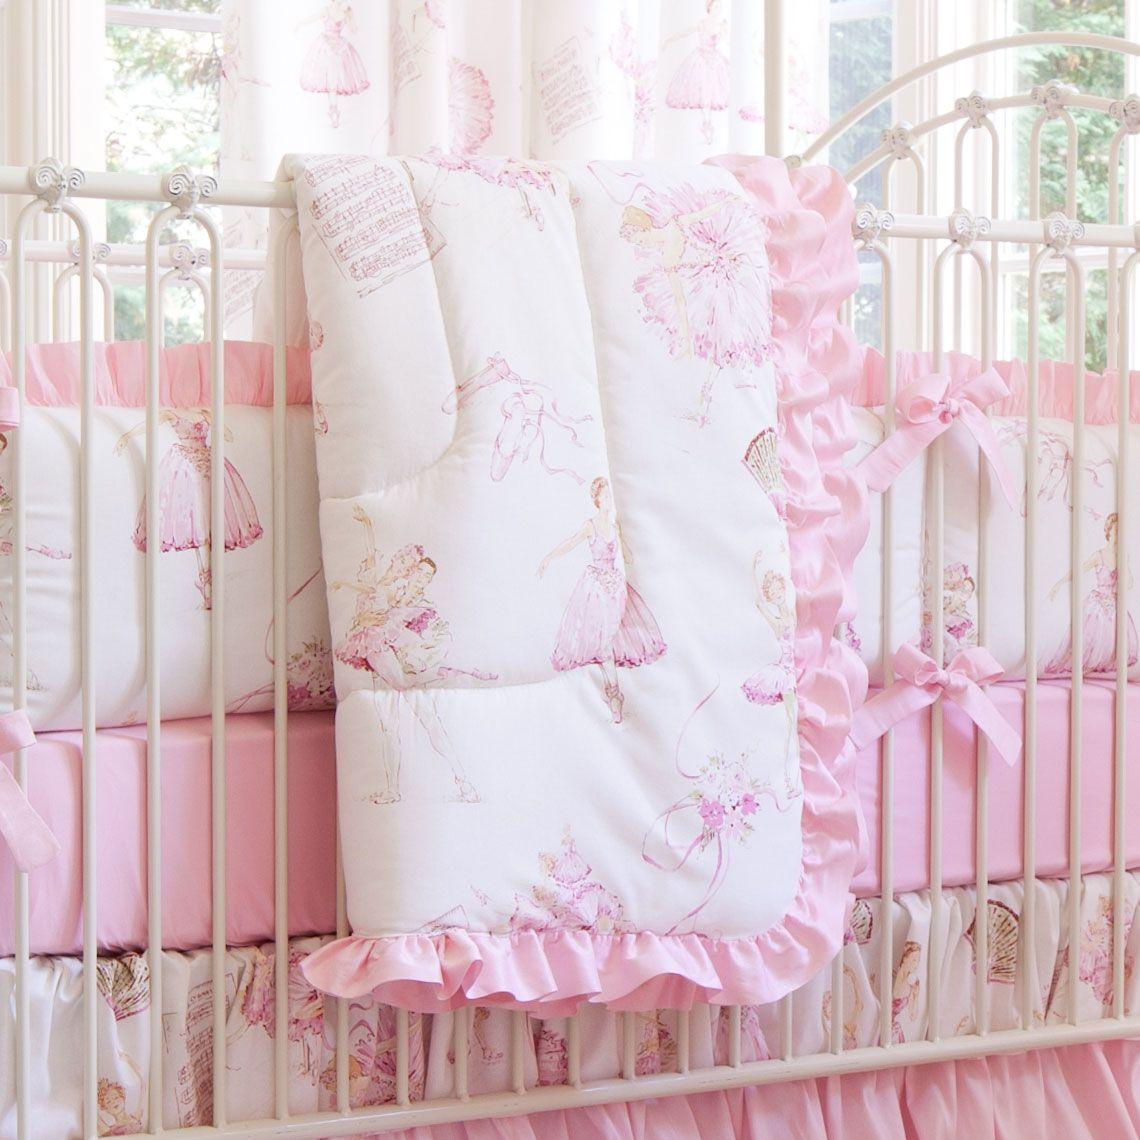 Royal Ballet Crib Comforter With Ruffle Carouseldesigns Crib